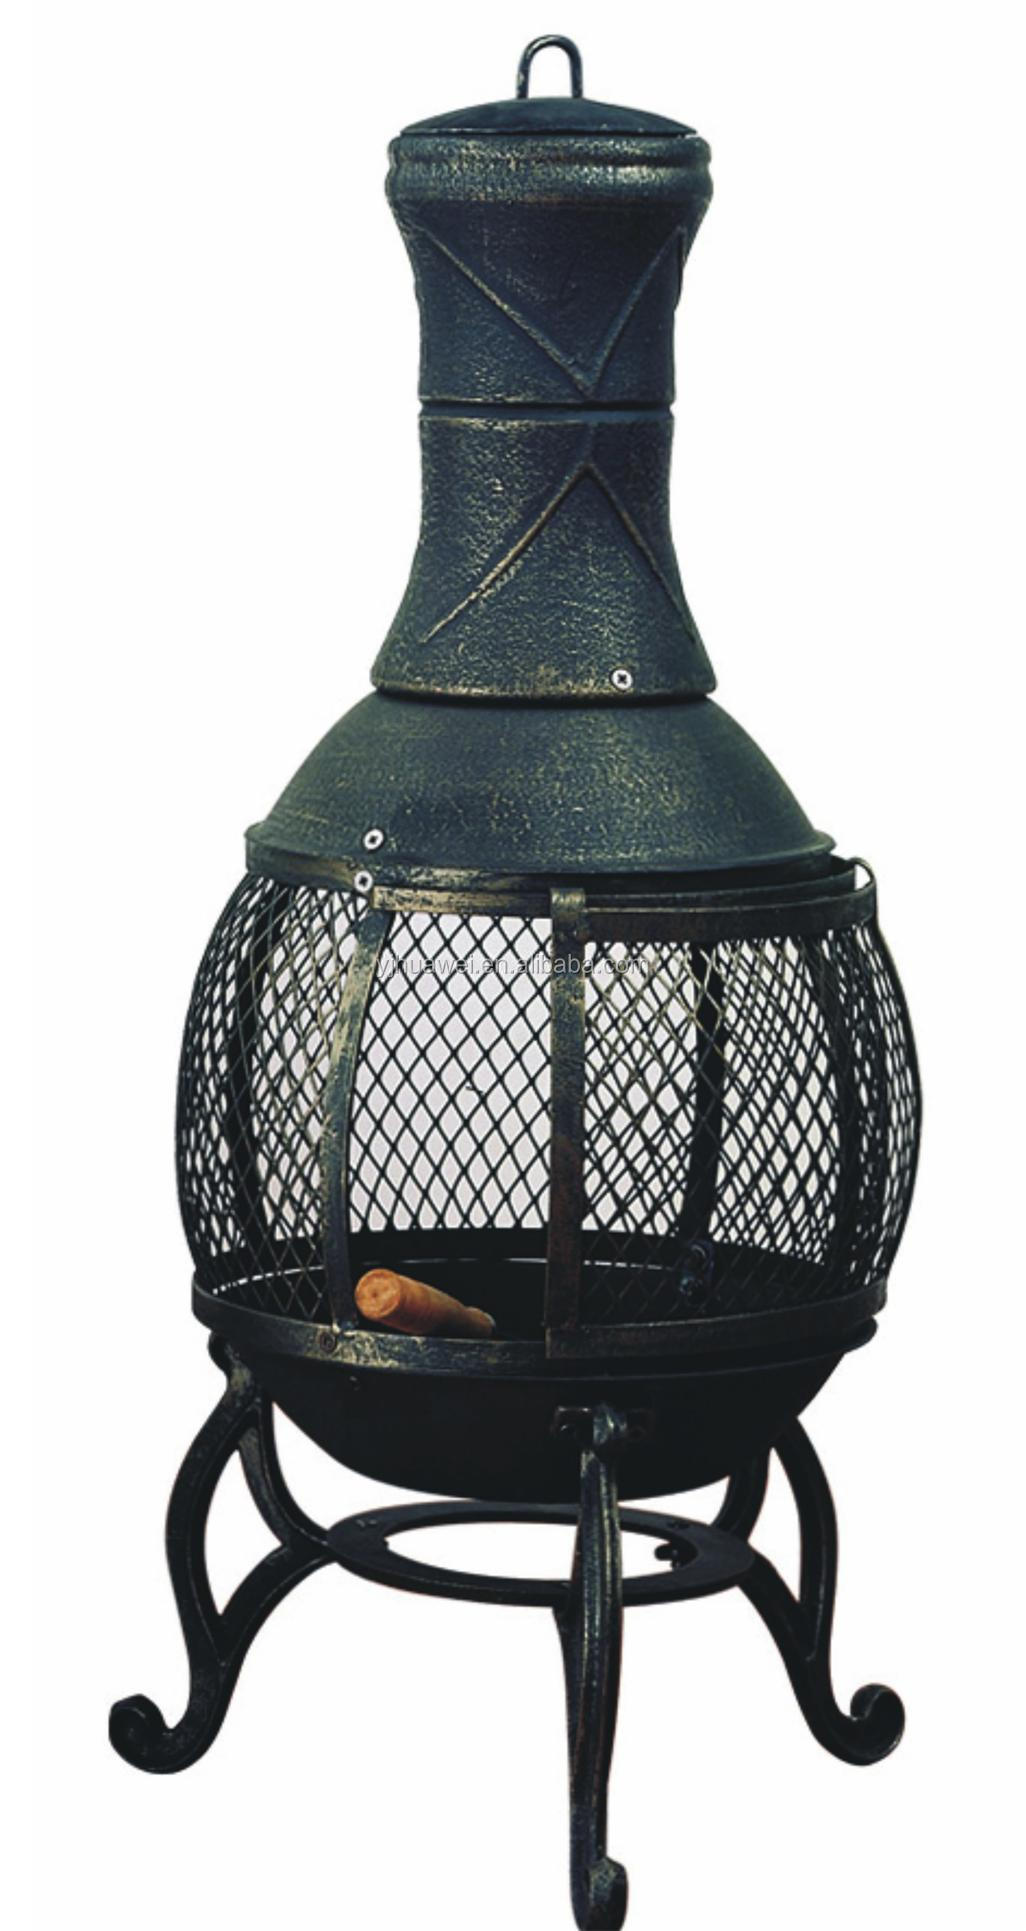 Cast Iron Outdoor Chiminea Modern Patio Outdoor